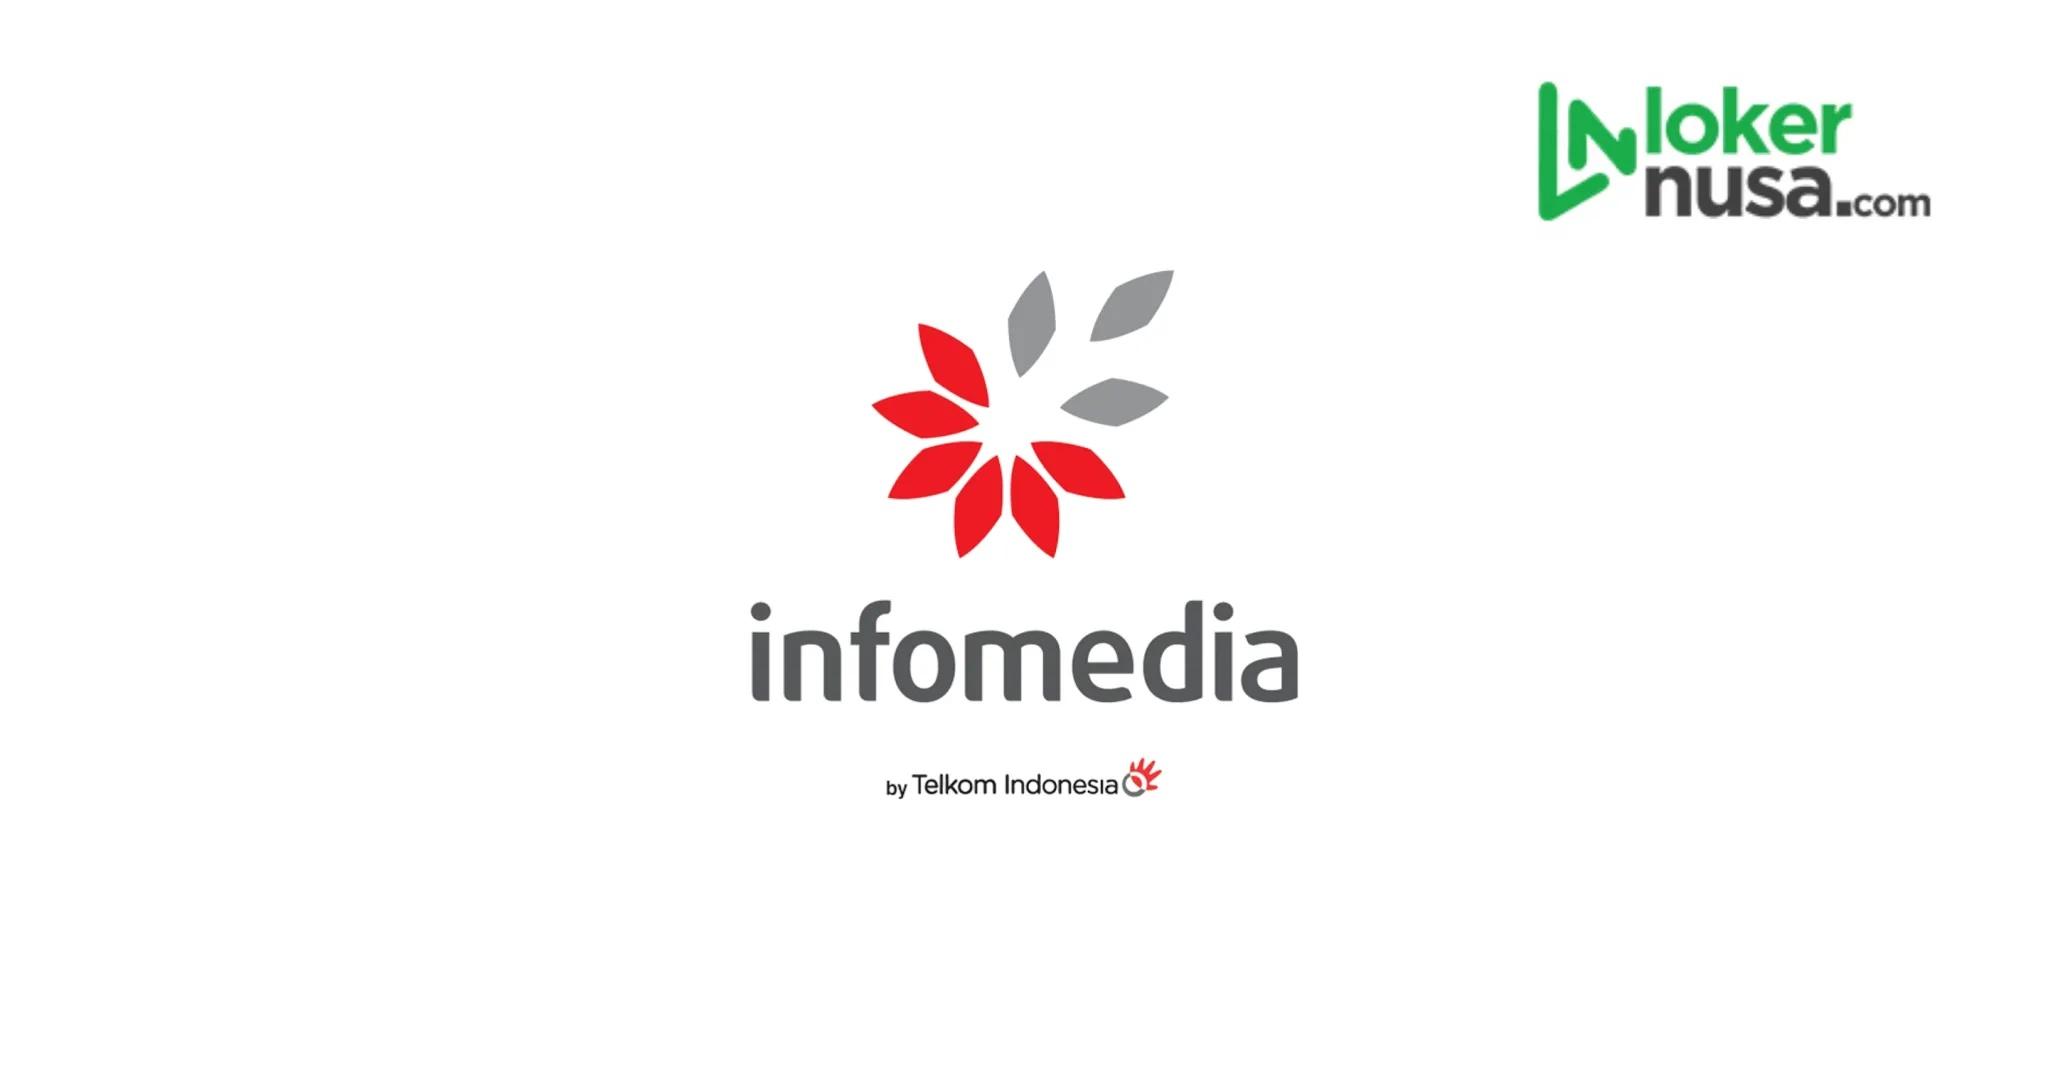 PT. Infomedia Nusantara